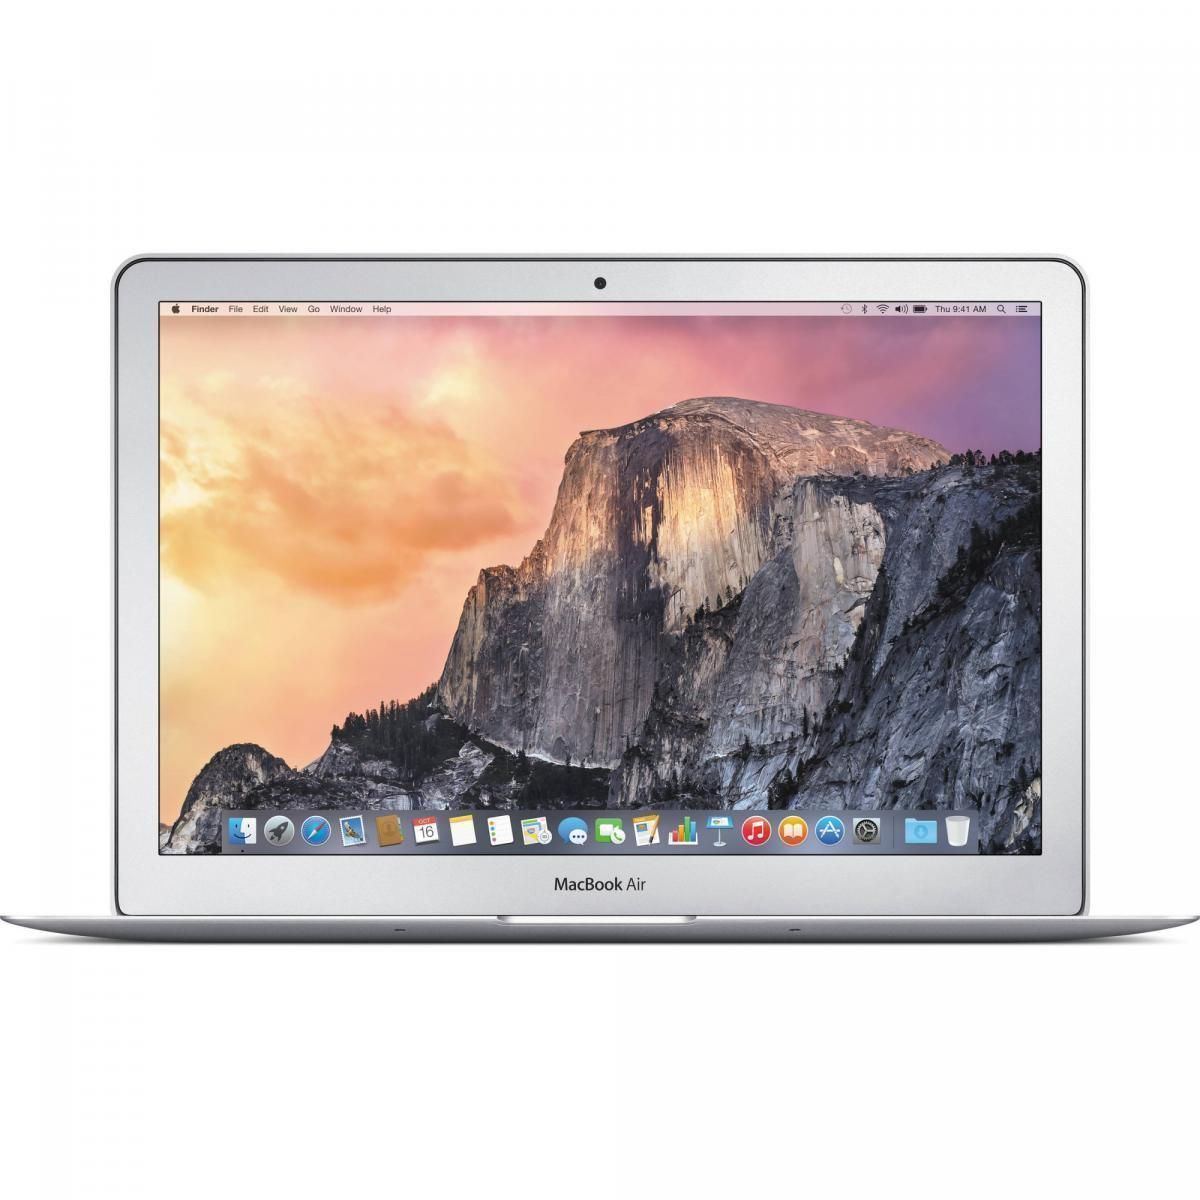 Apple MacBook Air 13 (MMGG2)MacBook Air<br>Ноутбук Apple MacBook Air 13 Early 2016 MMGG2 (Intel Core i5 1600 MHz/13.3/1440x900/8.0Gb/256Gb SSD/DVD нет/Intel HD Graphics 6000/Wi-Fi/Bluetooth/MacOS X)<br>